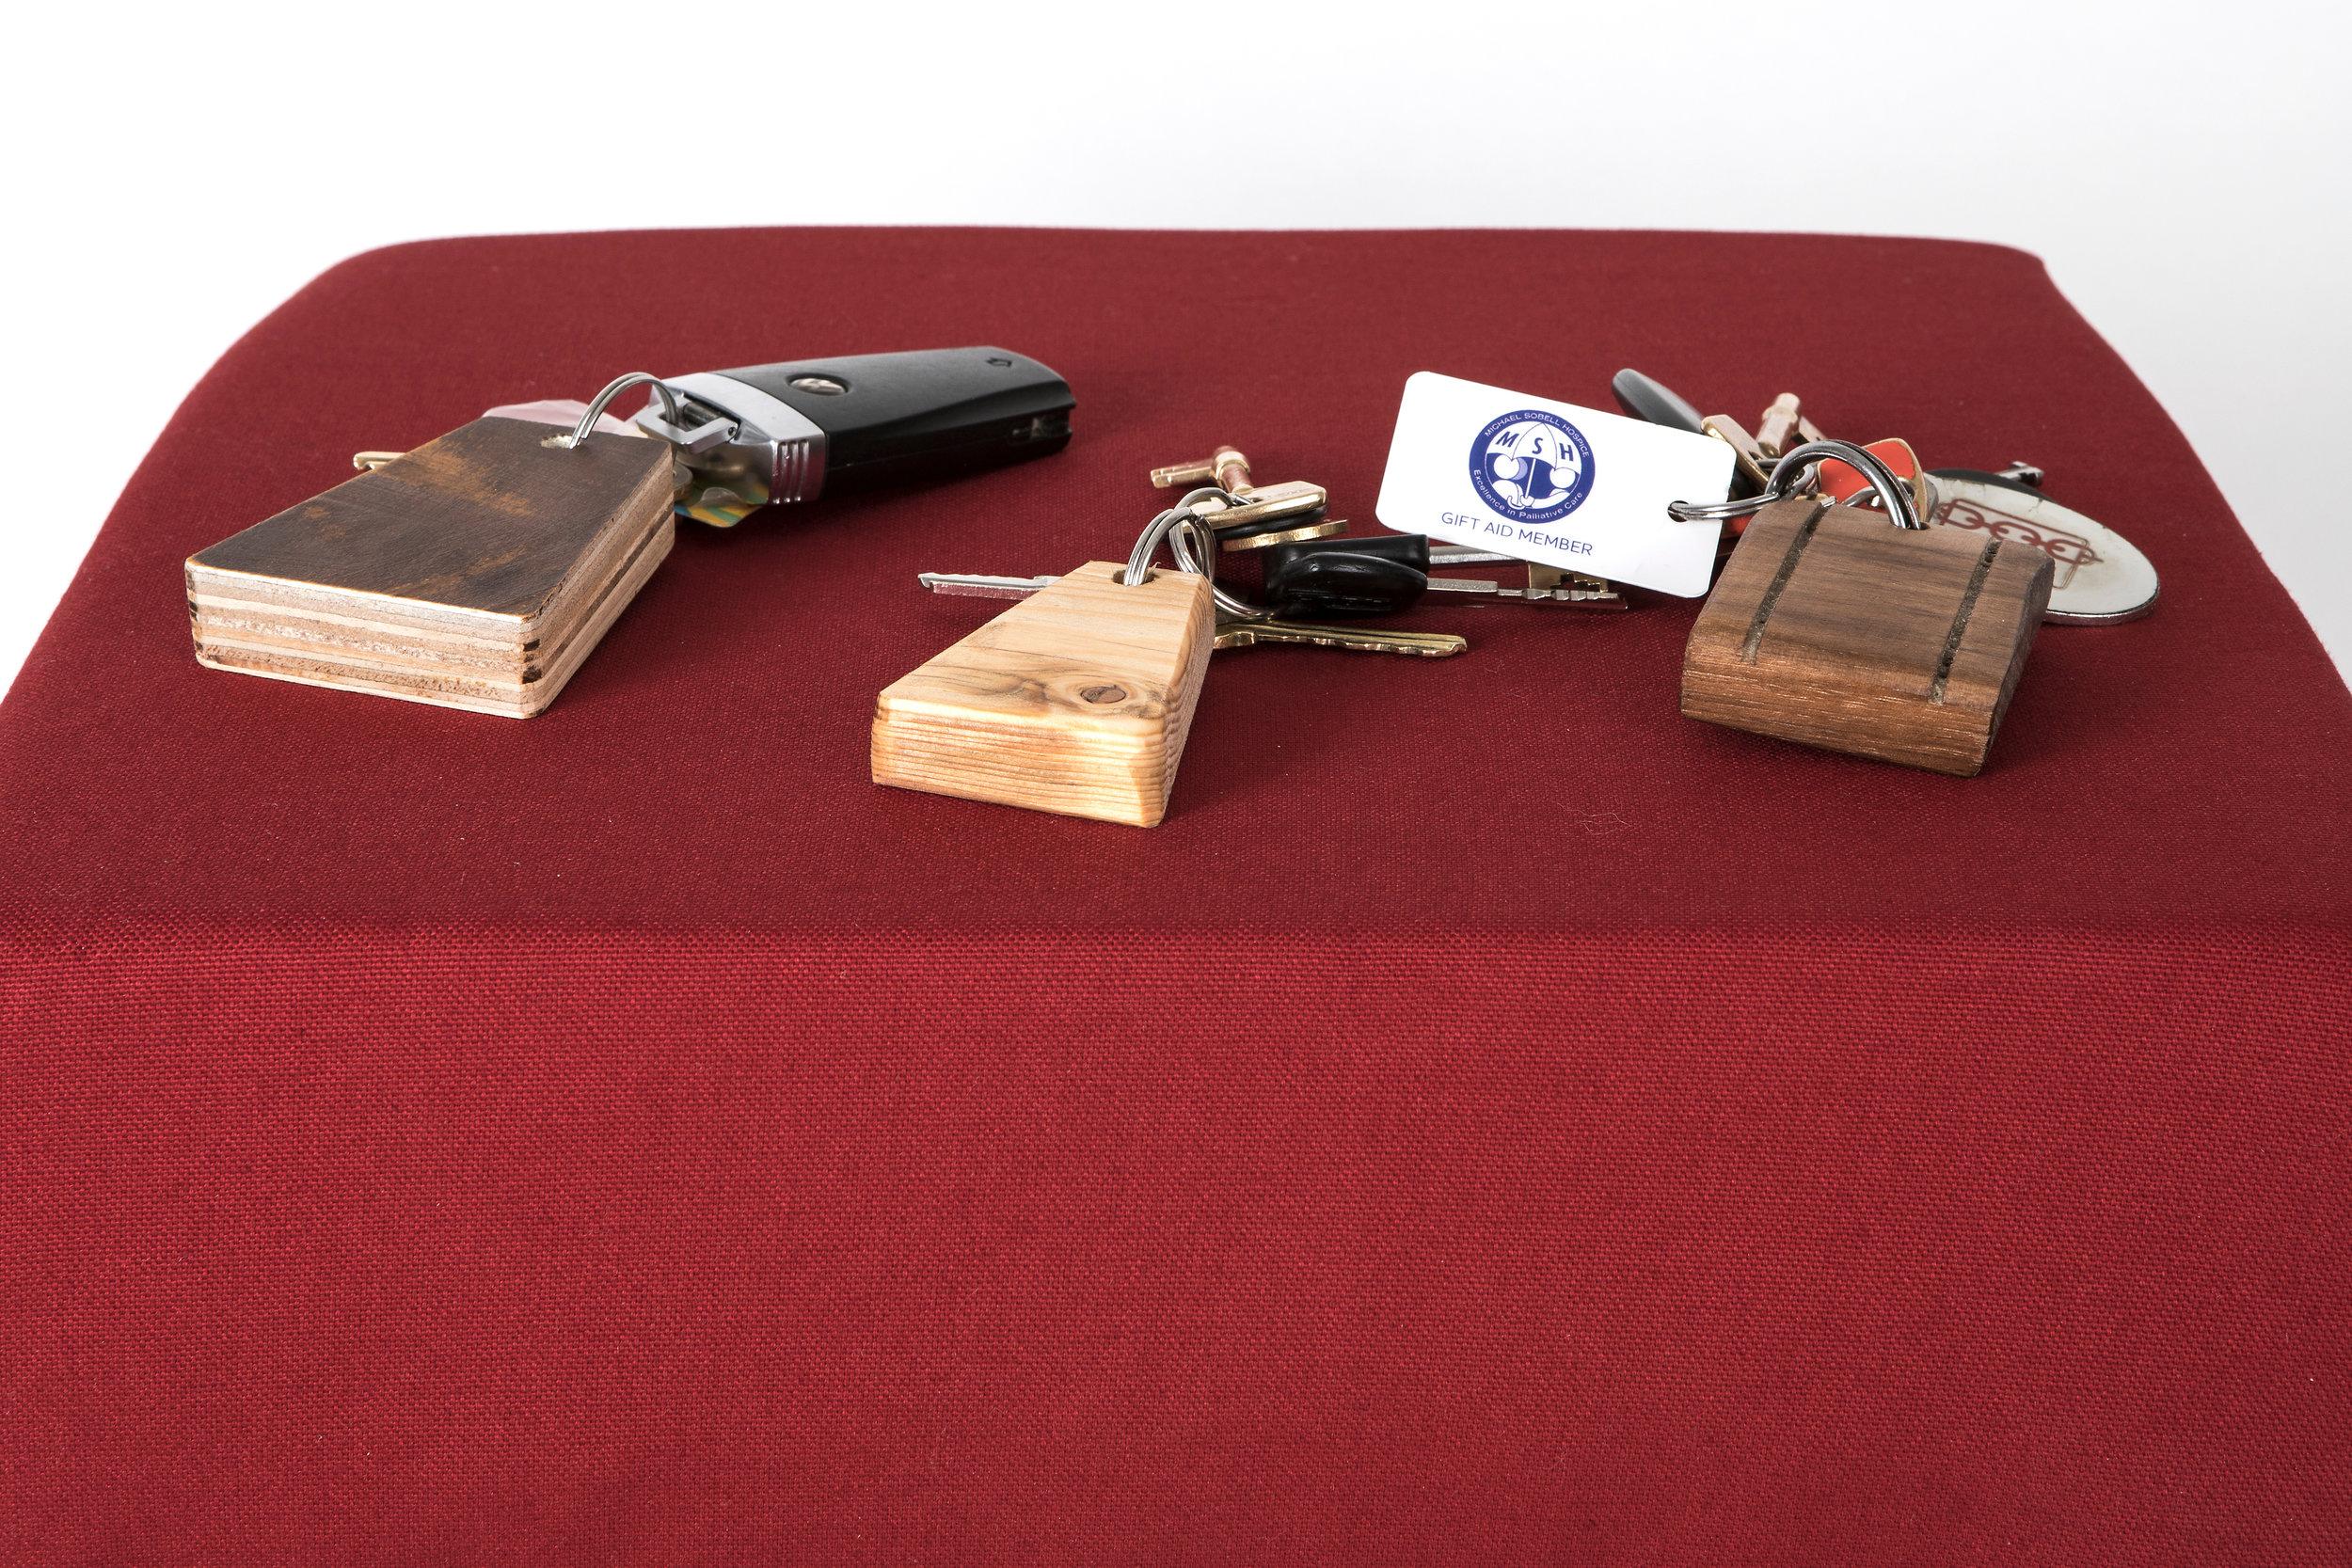 Key-rings